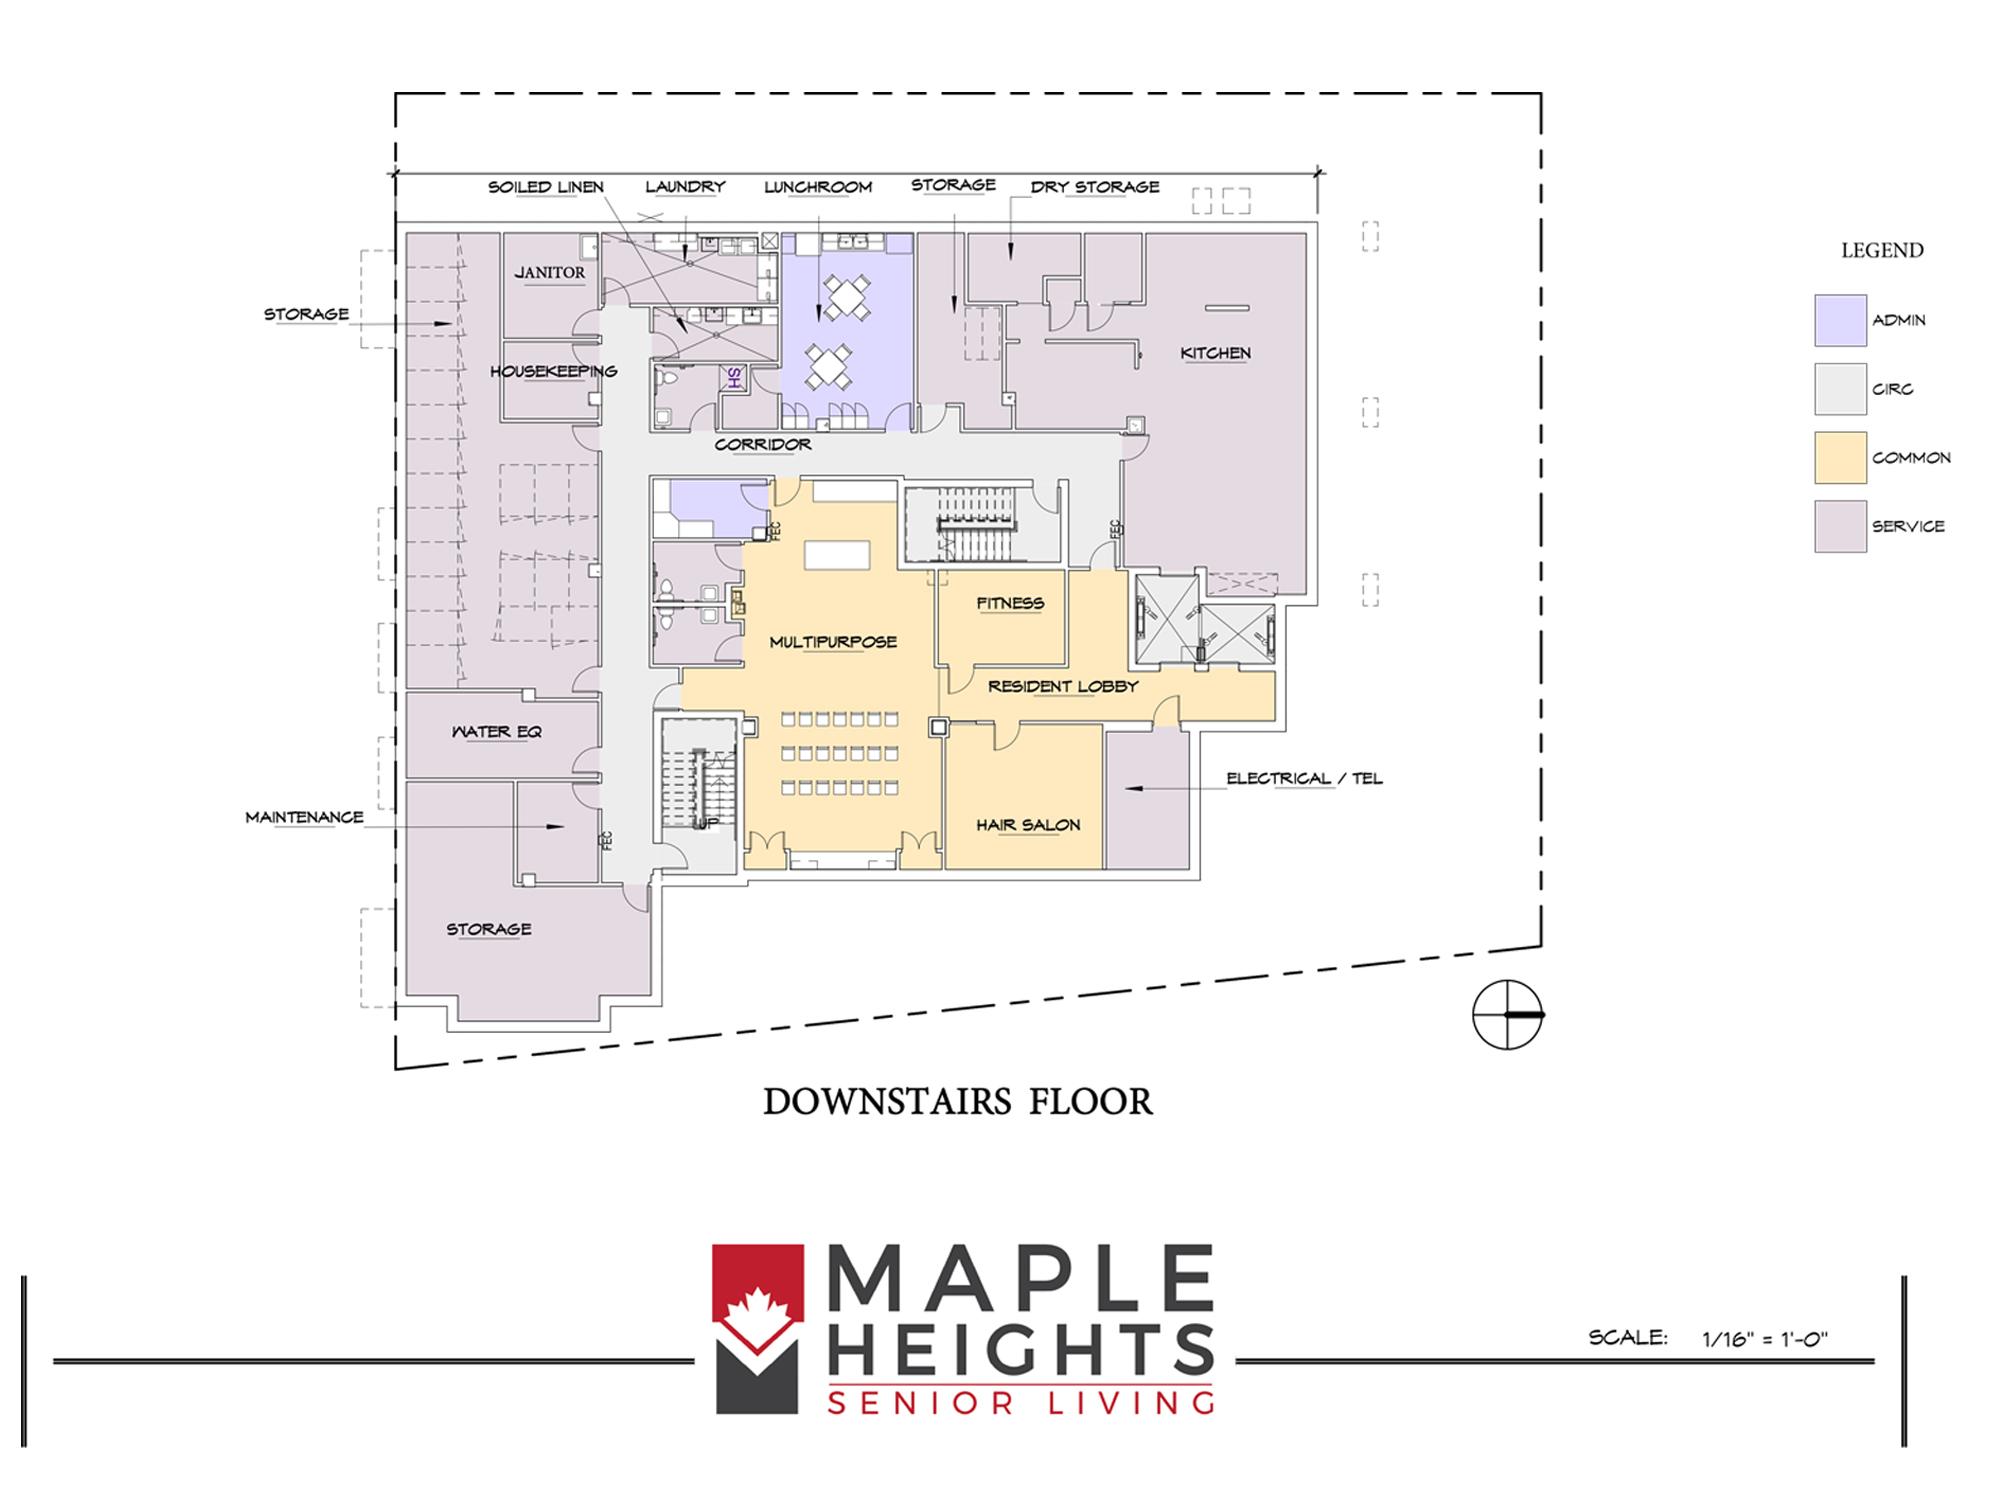 Washington DC Senior Living Floor Plan Downstairs